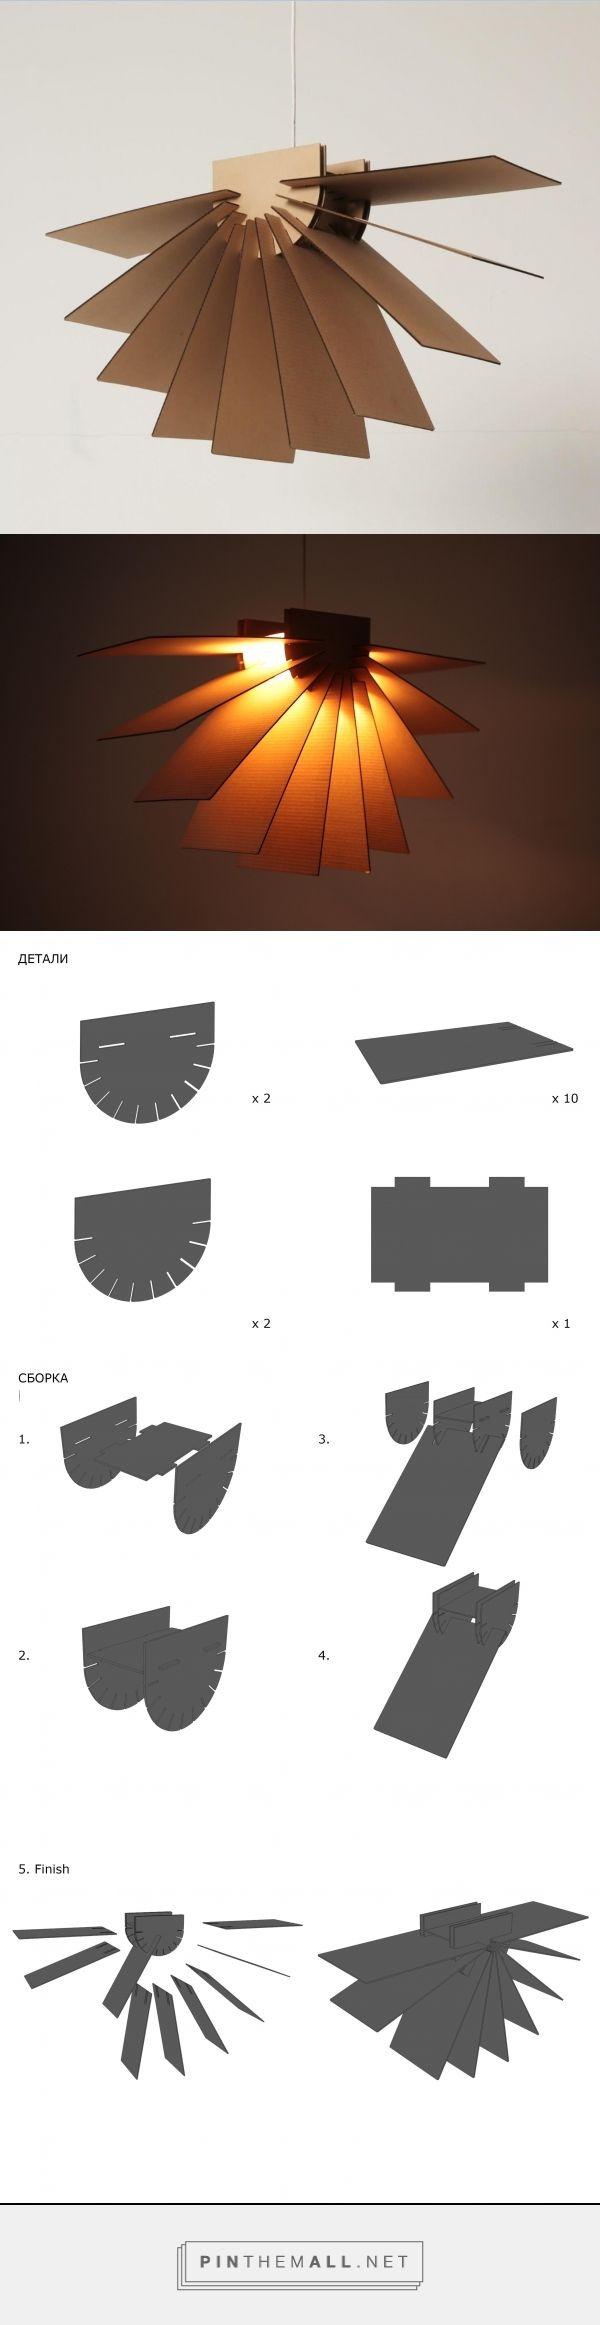 Cardboard lamp designed by Angelina Polousova | Made with lazer сarver machine | curator Arseniy Serg